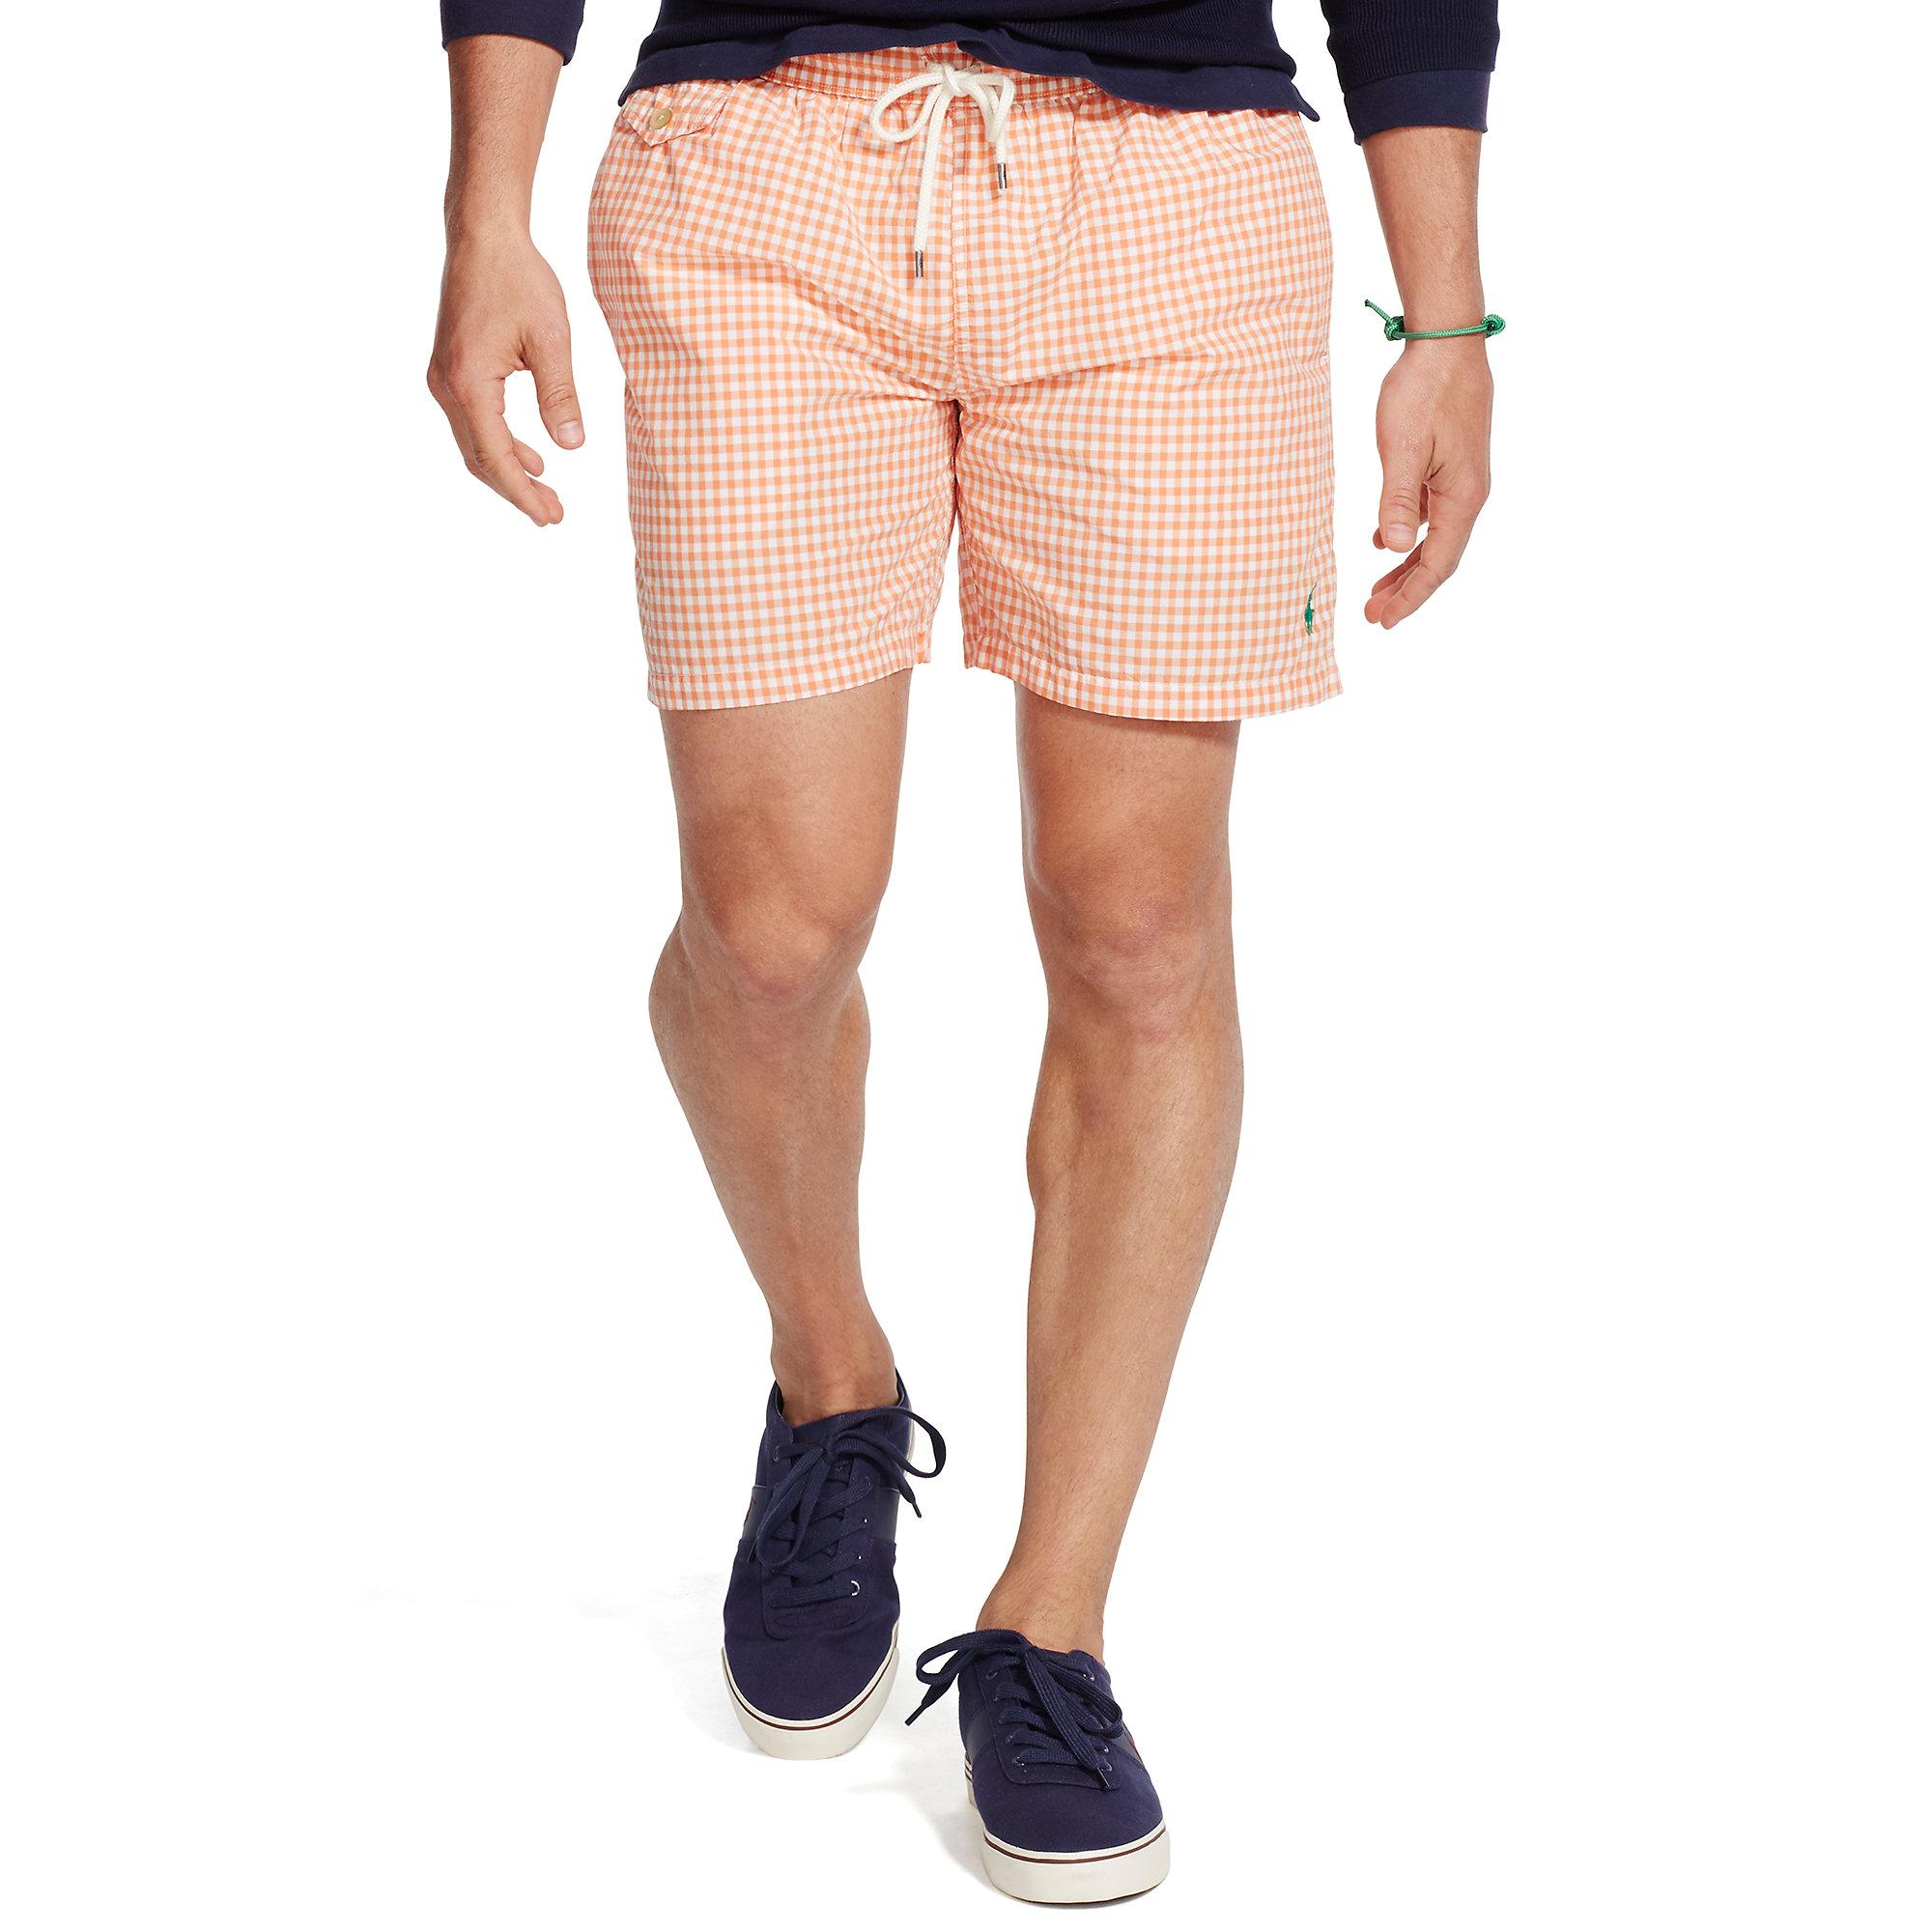 Lyst Polo Ralph Lauren 5 Inch Traveler Swim Trunk In Orange For Men